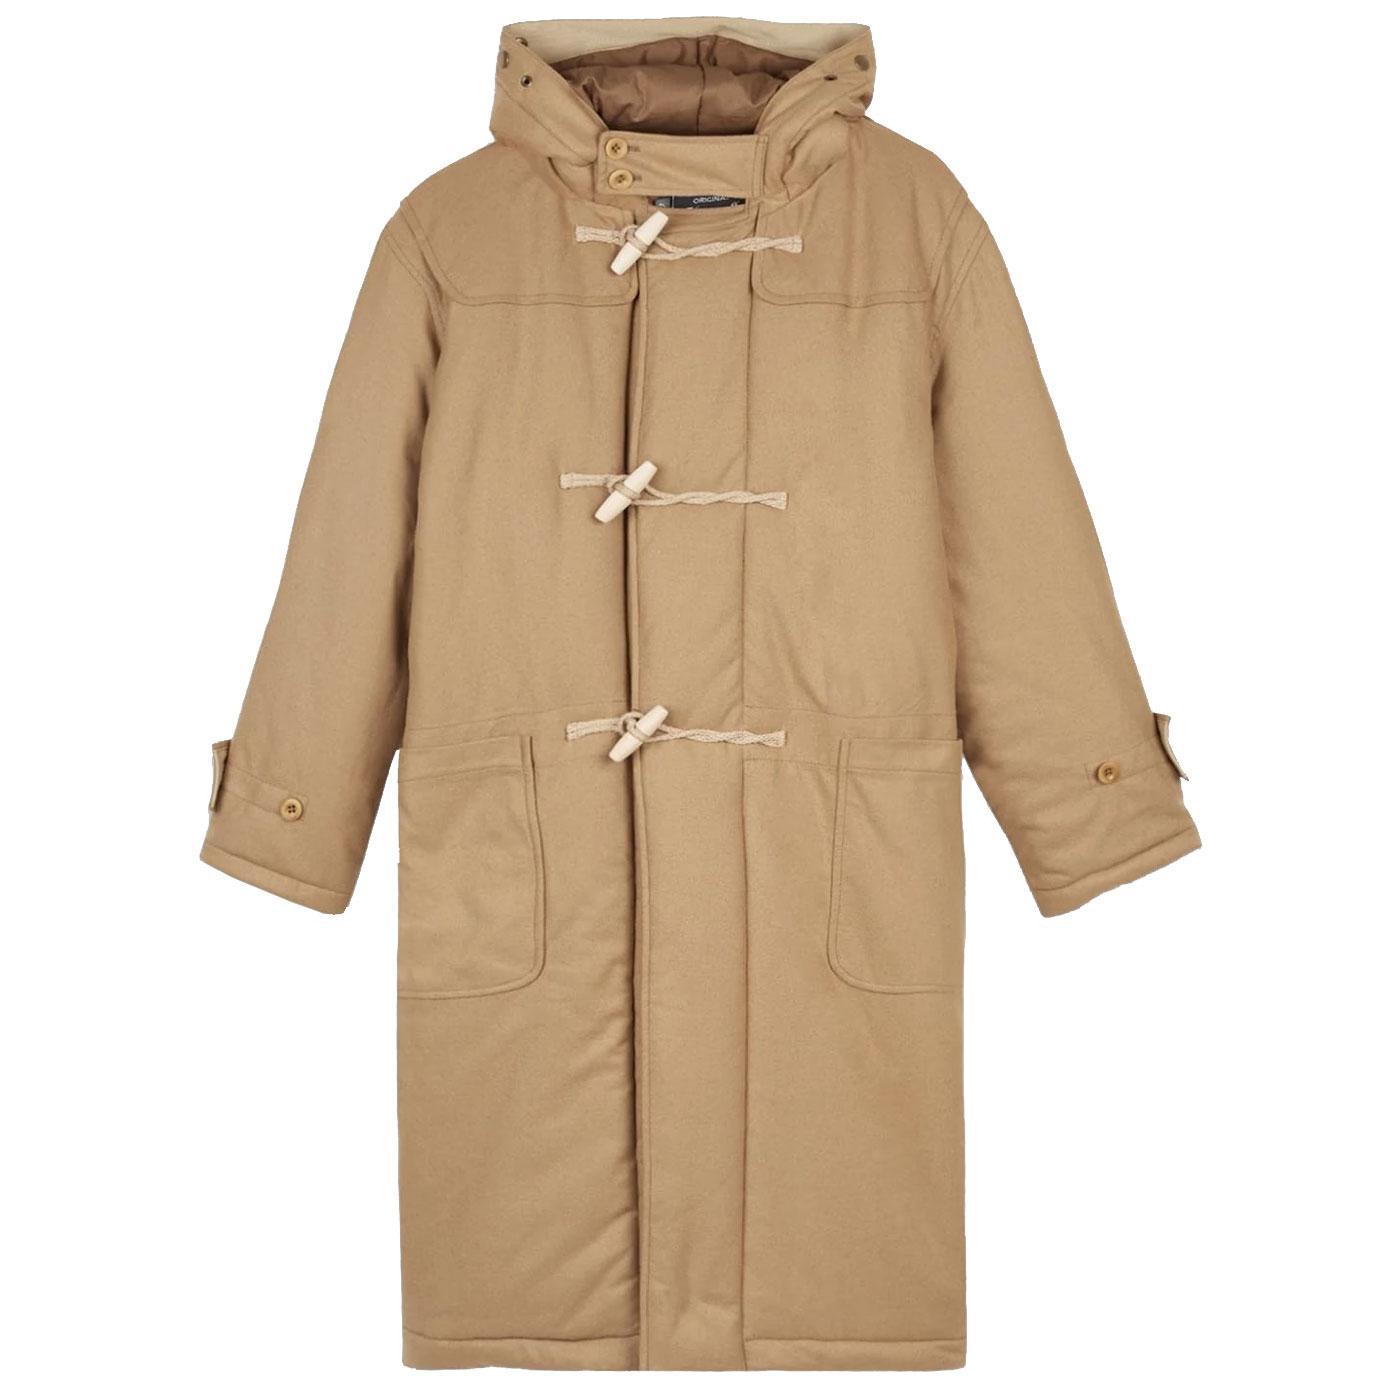 GLOVERALL Men's Retro Padded Insulated Duffle Coat